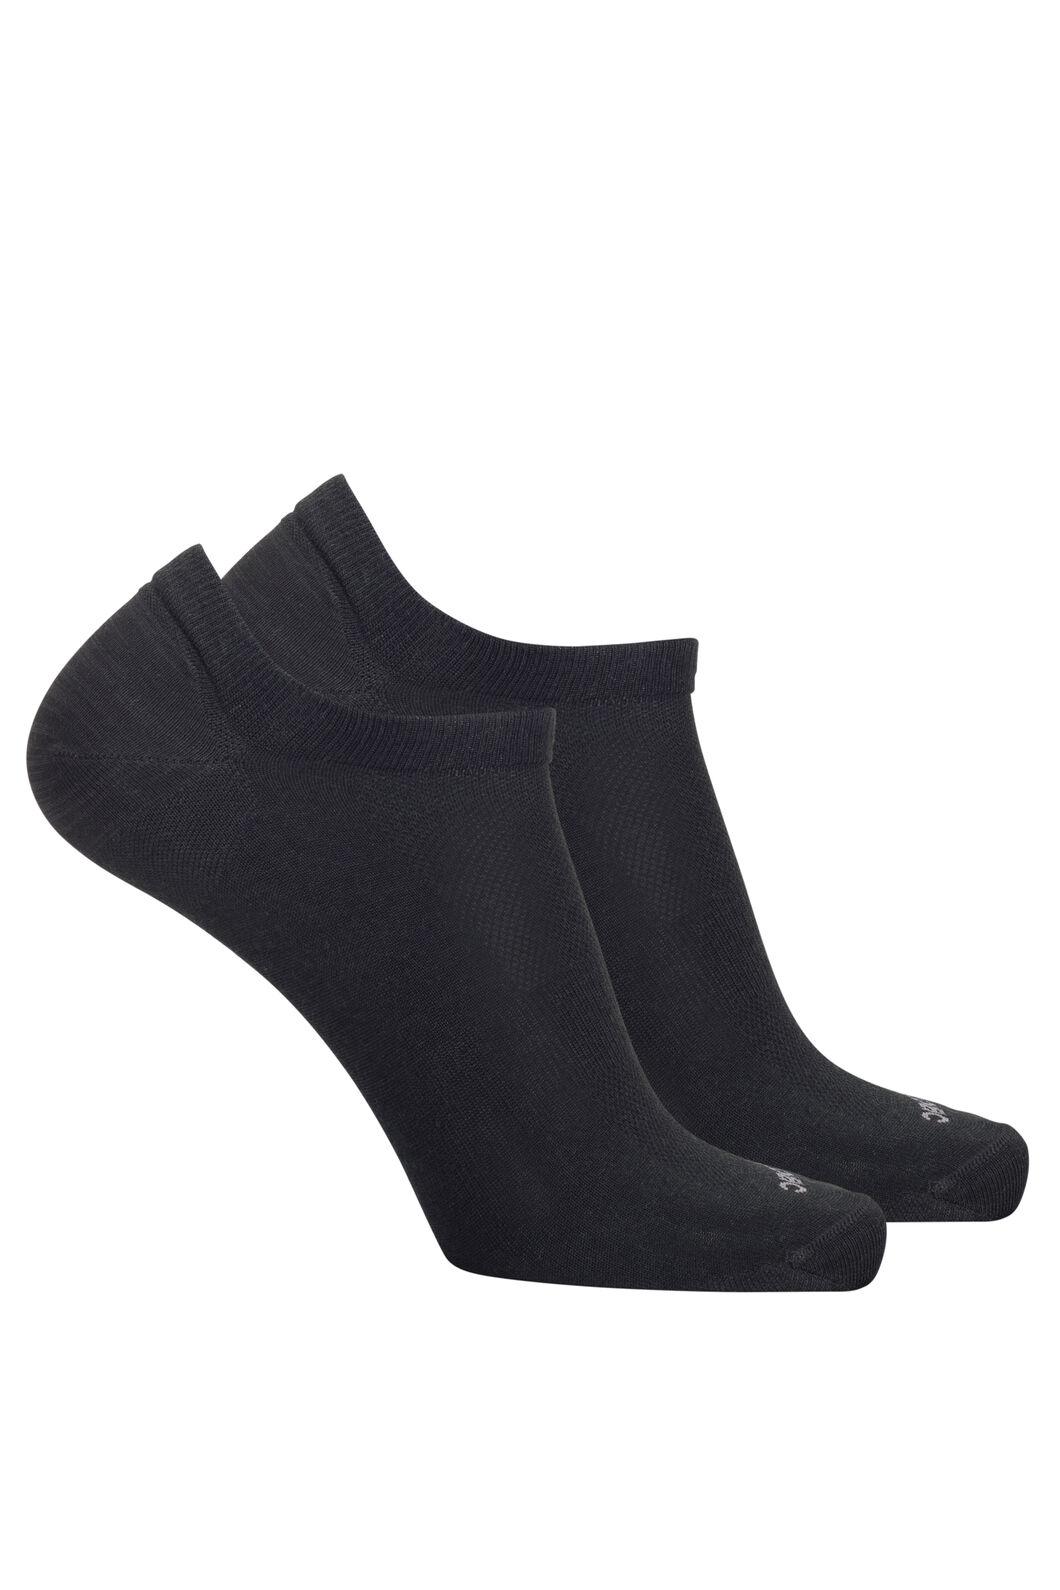 Macpac Merino Blend Anklet Socks — 2 Pack, Black, hi-res